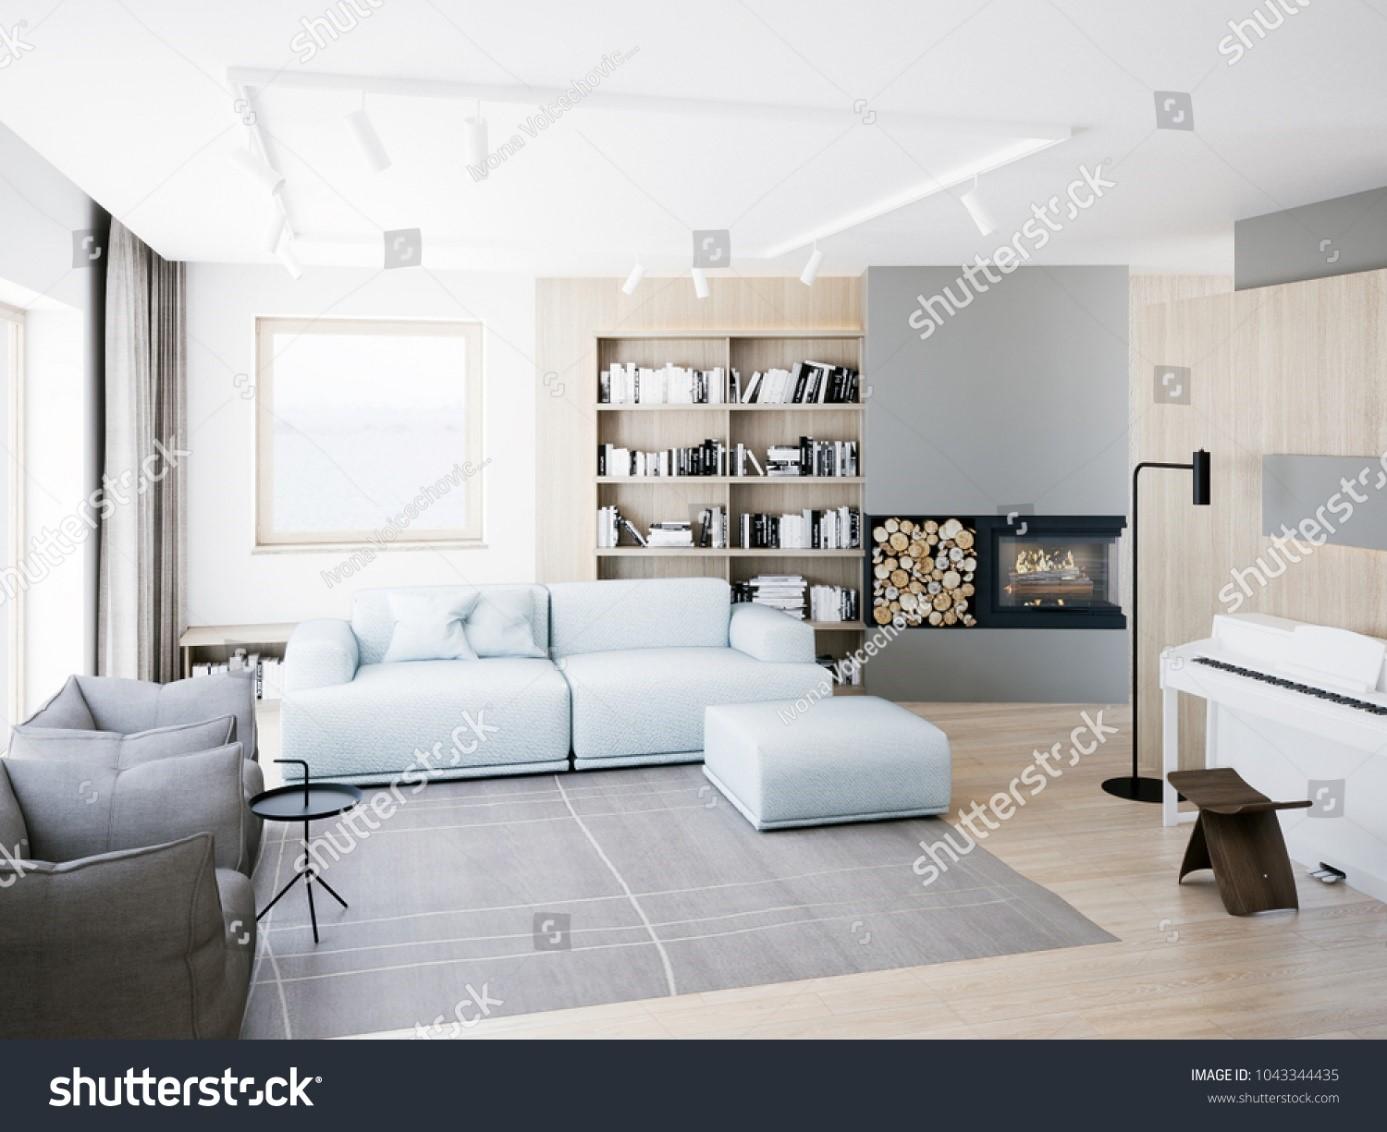 Representación de salón de estilo contemporáneo.